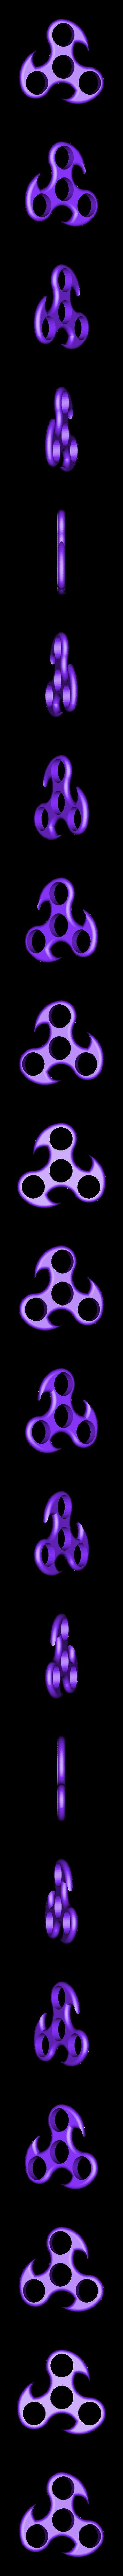 Projet 2.STL Download STL file hand spinner • 3D print template, RomainMarcheron